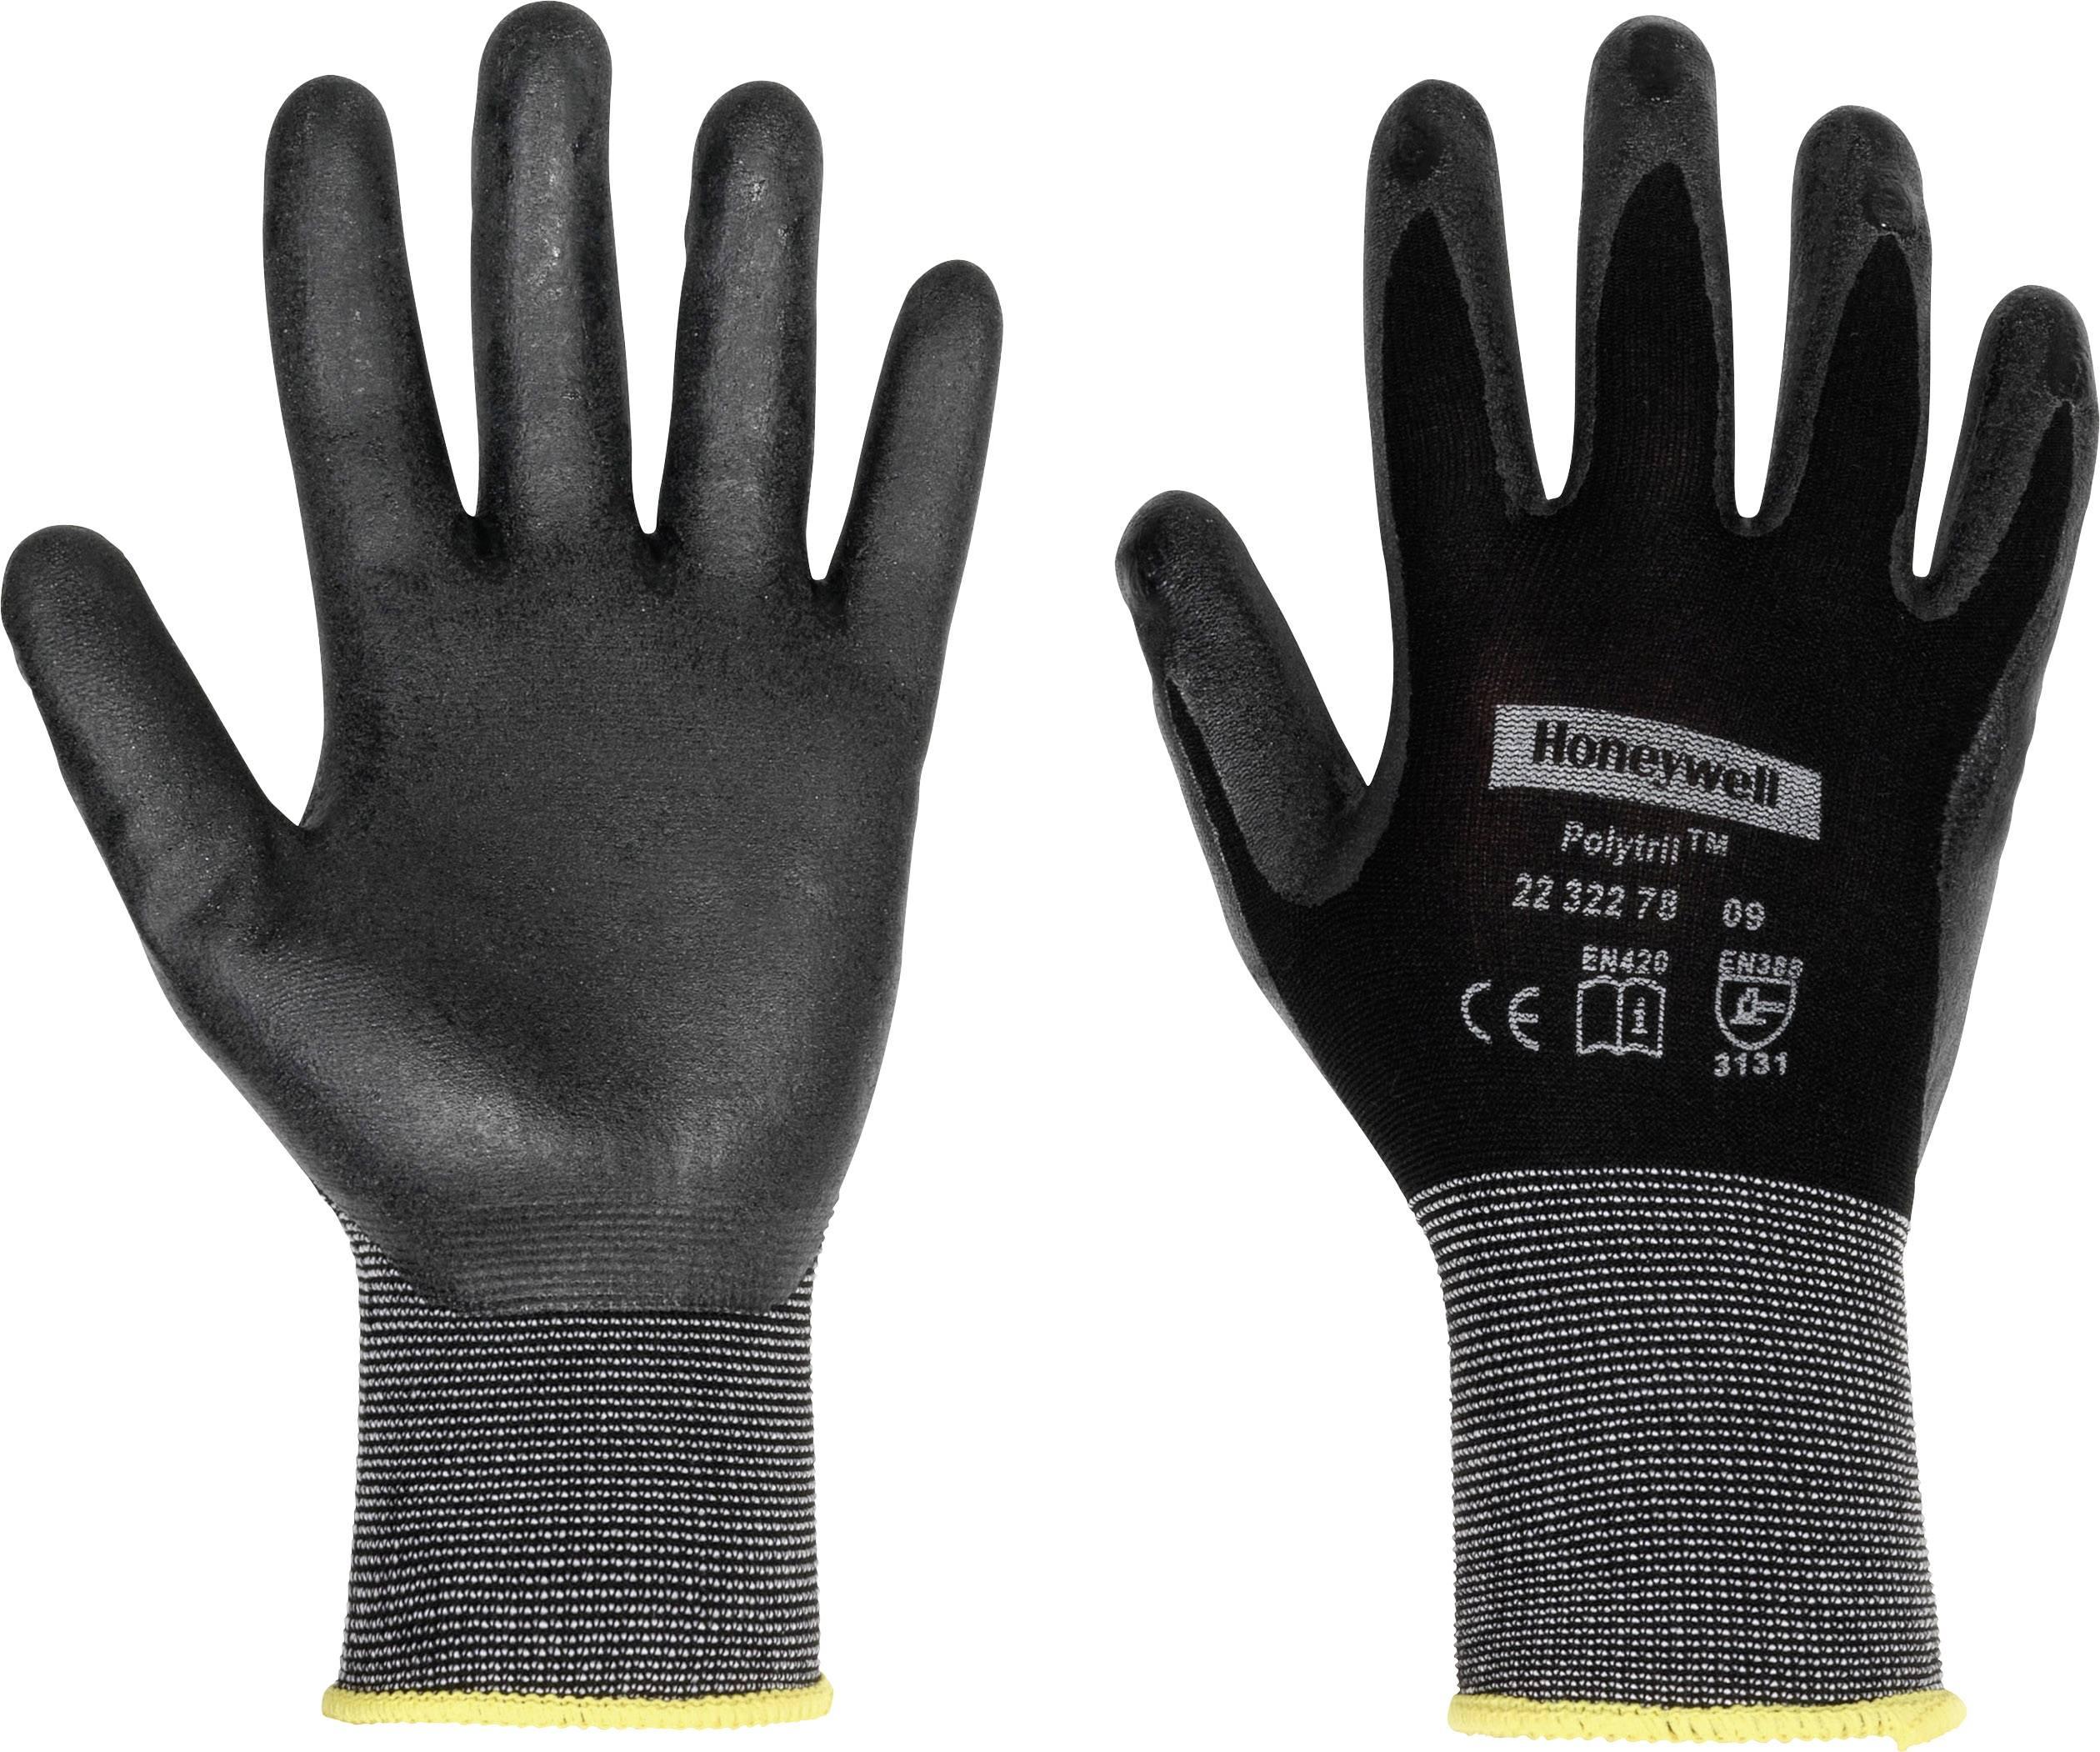 Honeywell Polytril Black Gloves Size 9